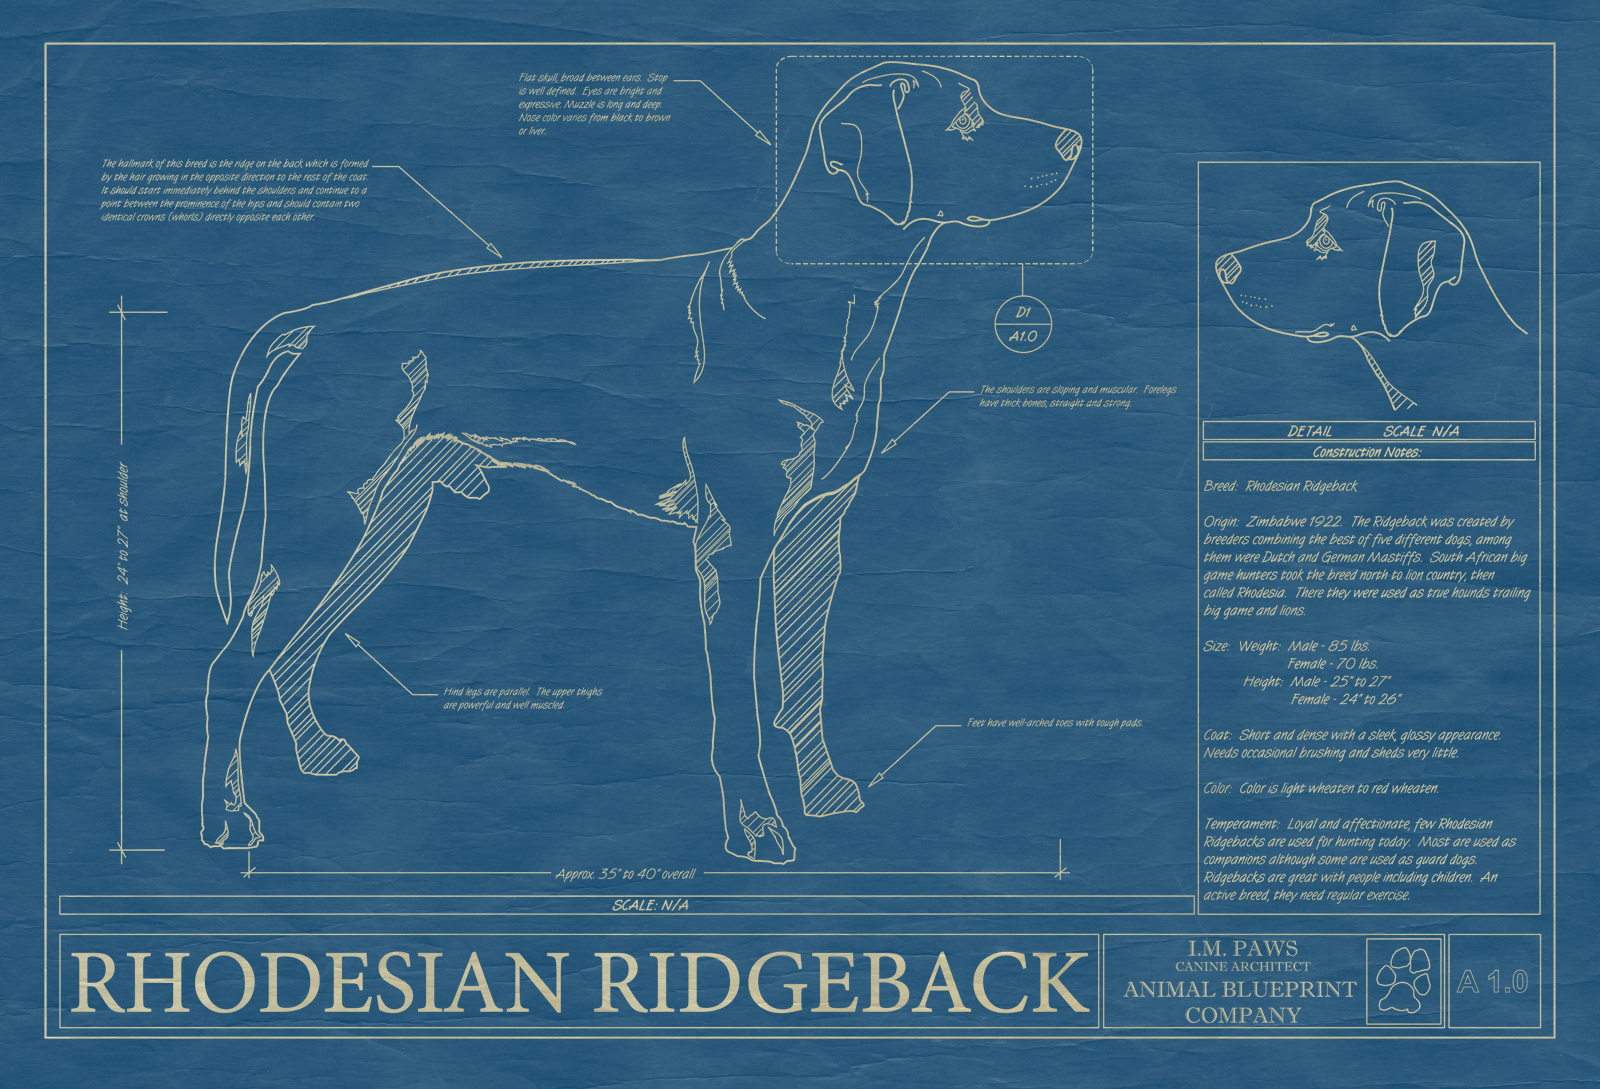 Rhodesian ridgeback animal blueprint company rhodesian ridgeback dog blueprint malvernweather Gallery